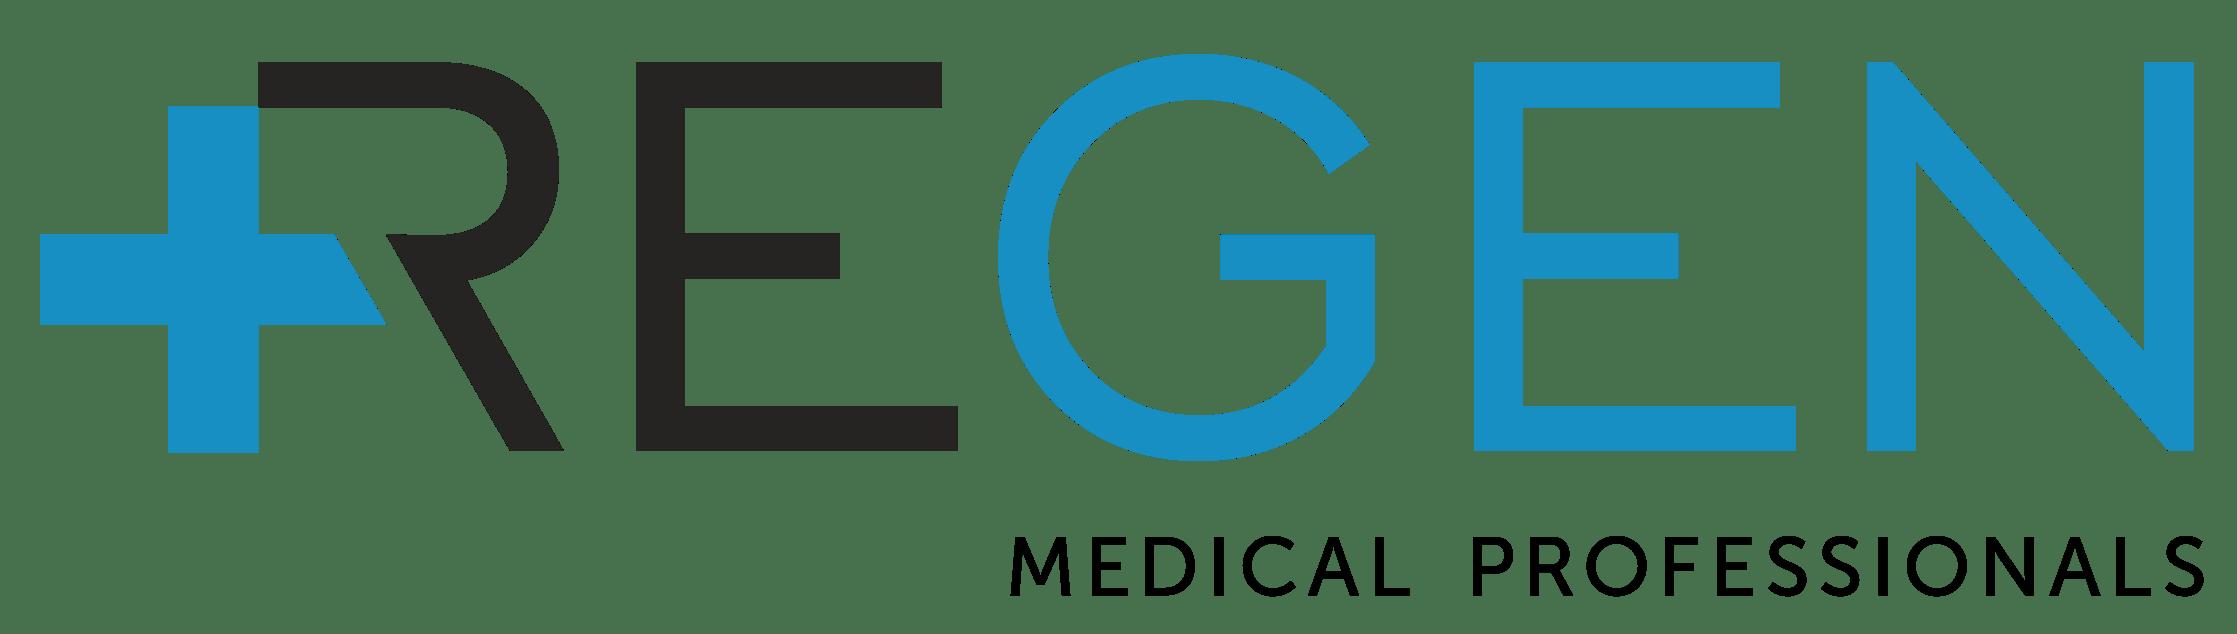 logo Medical Professonals REGEN